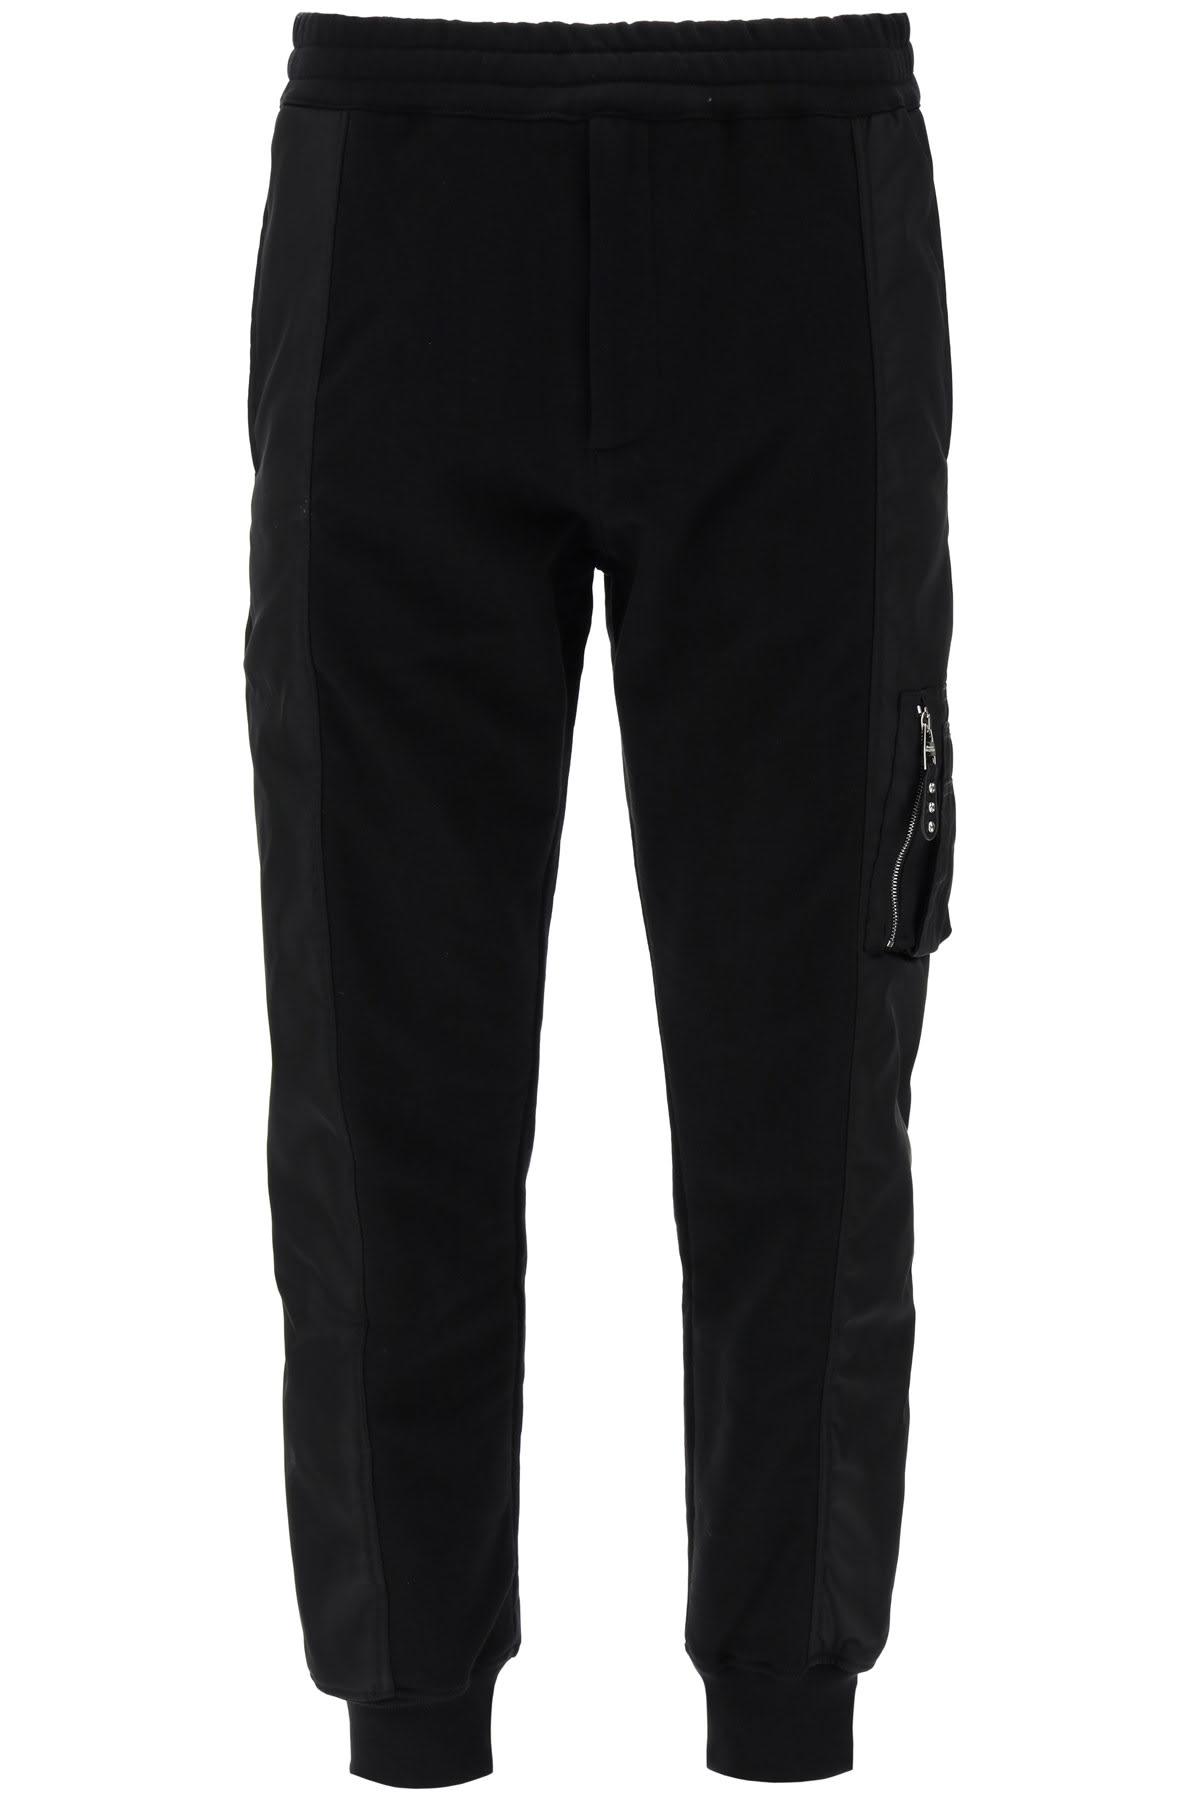 Alexander McQueen Bi-material Jogger Pants